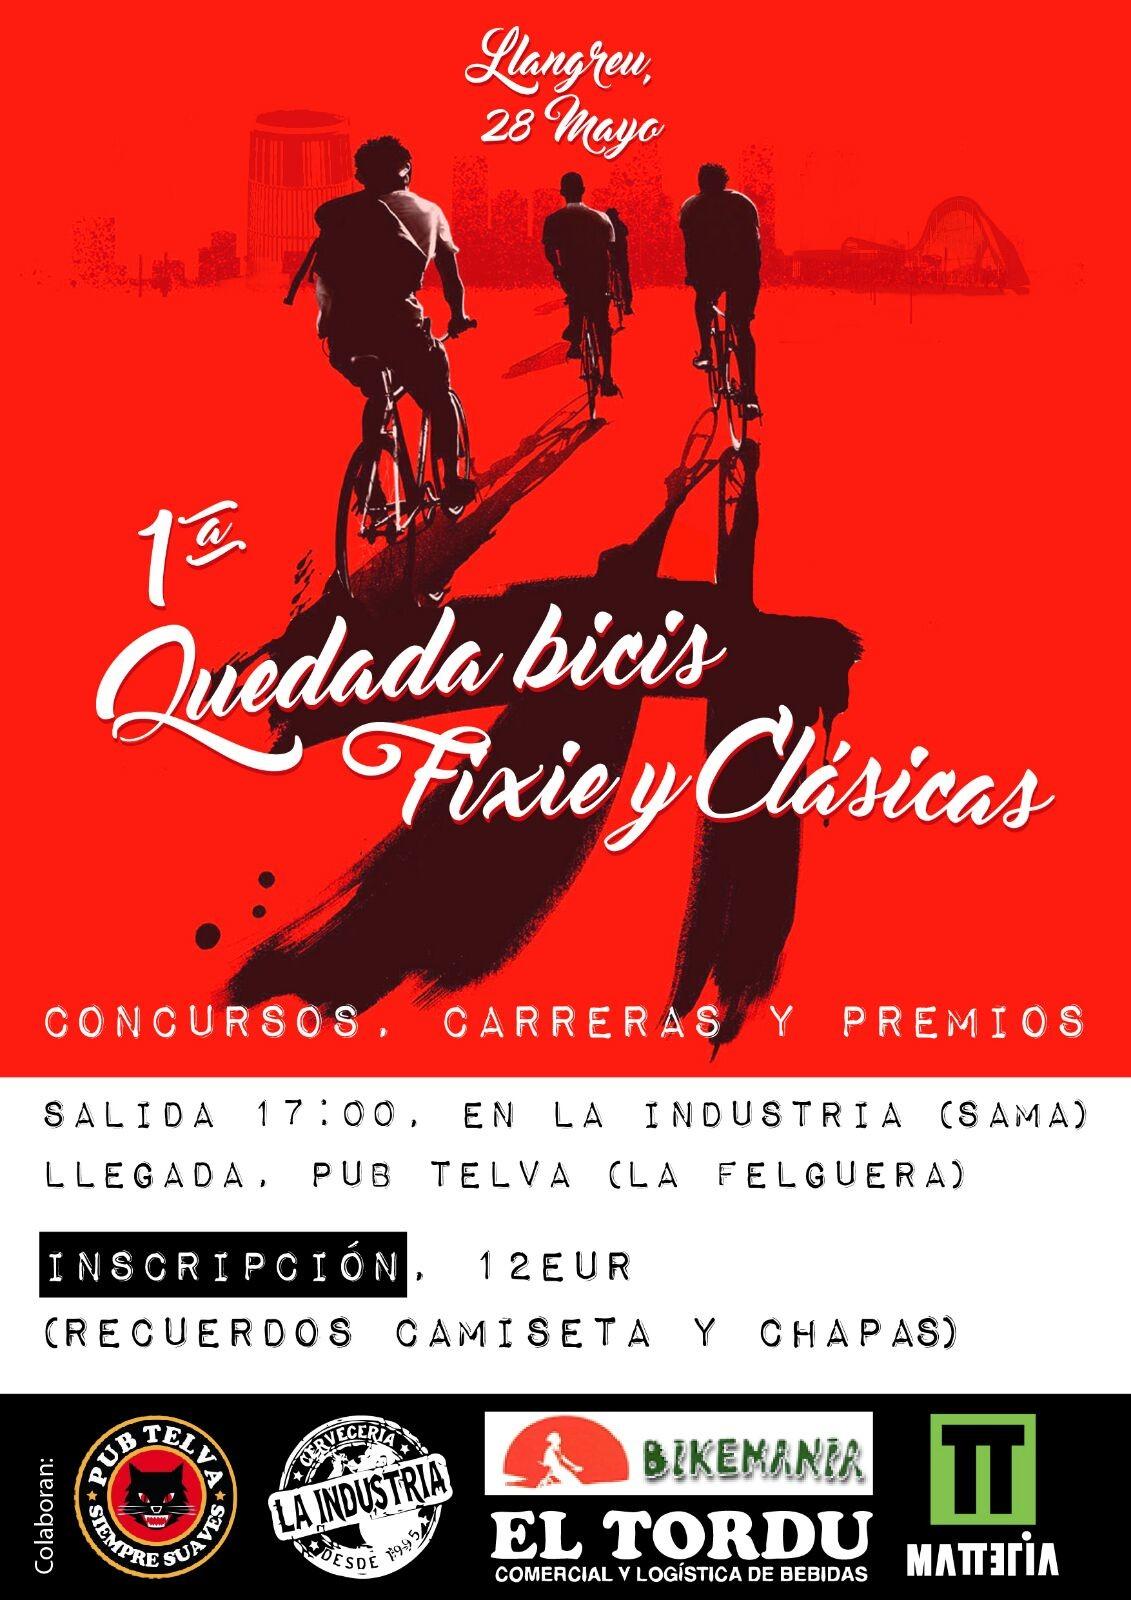 1º Quedada bicis fixie y clasicas